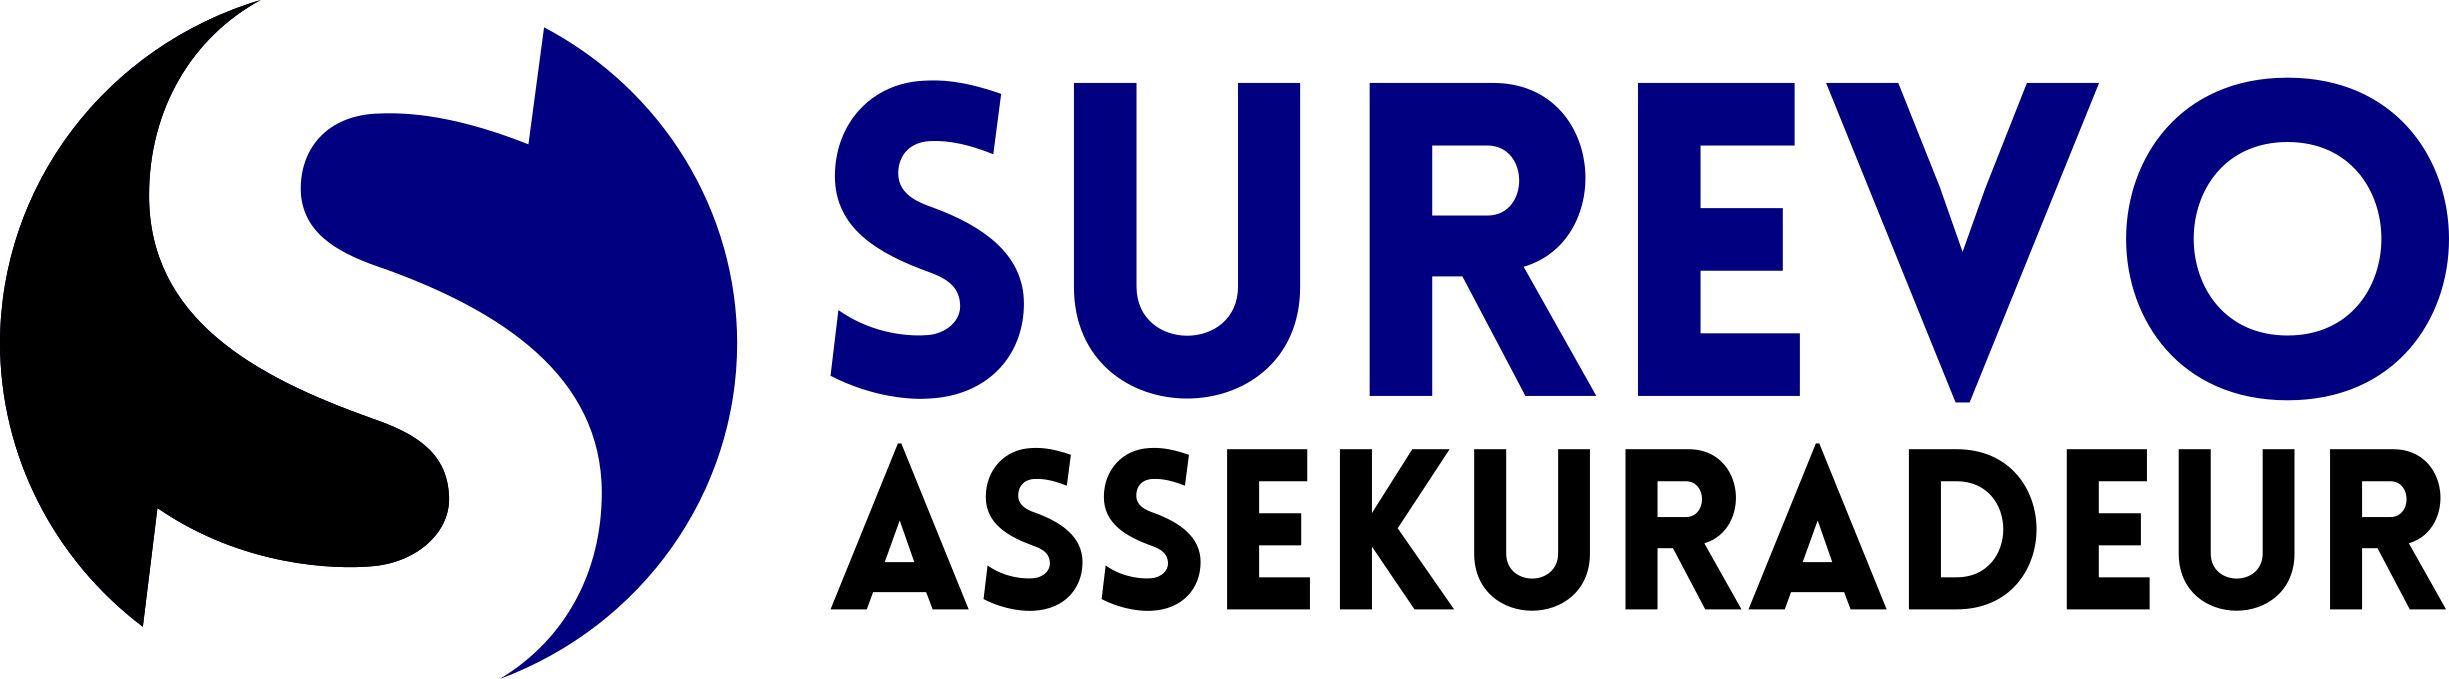 Logo SUREVO S blauschwarz Assek